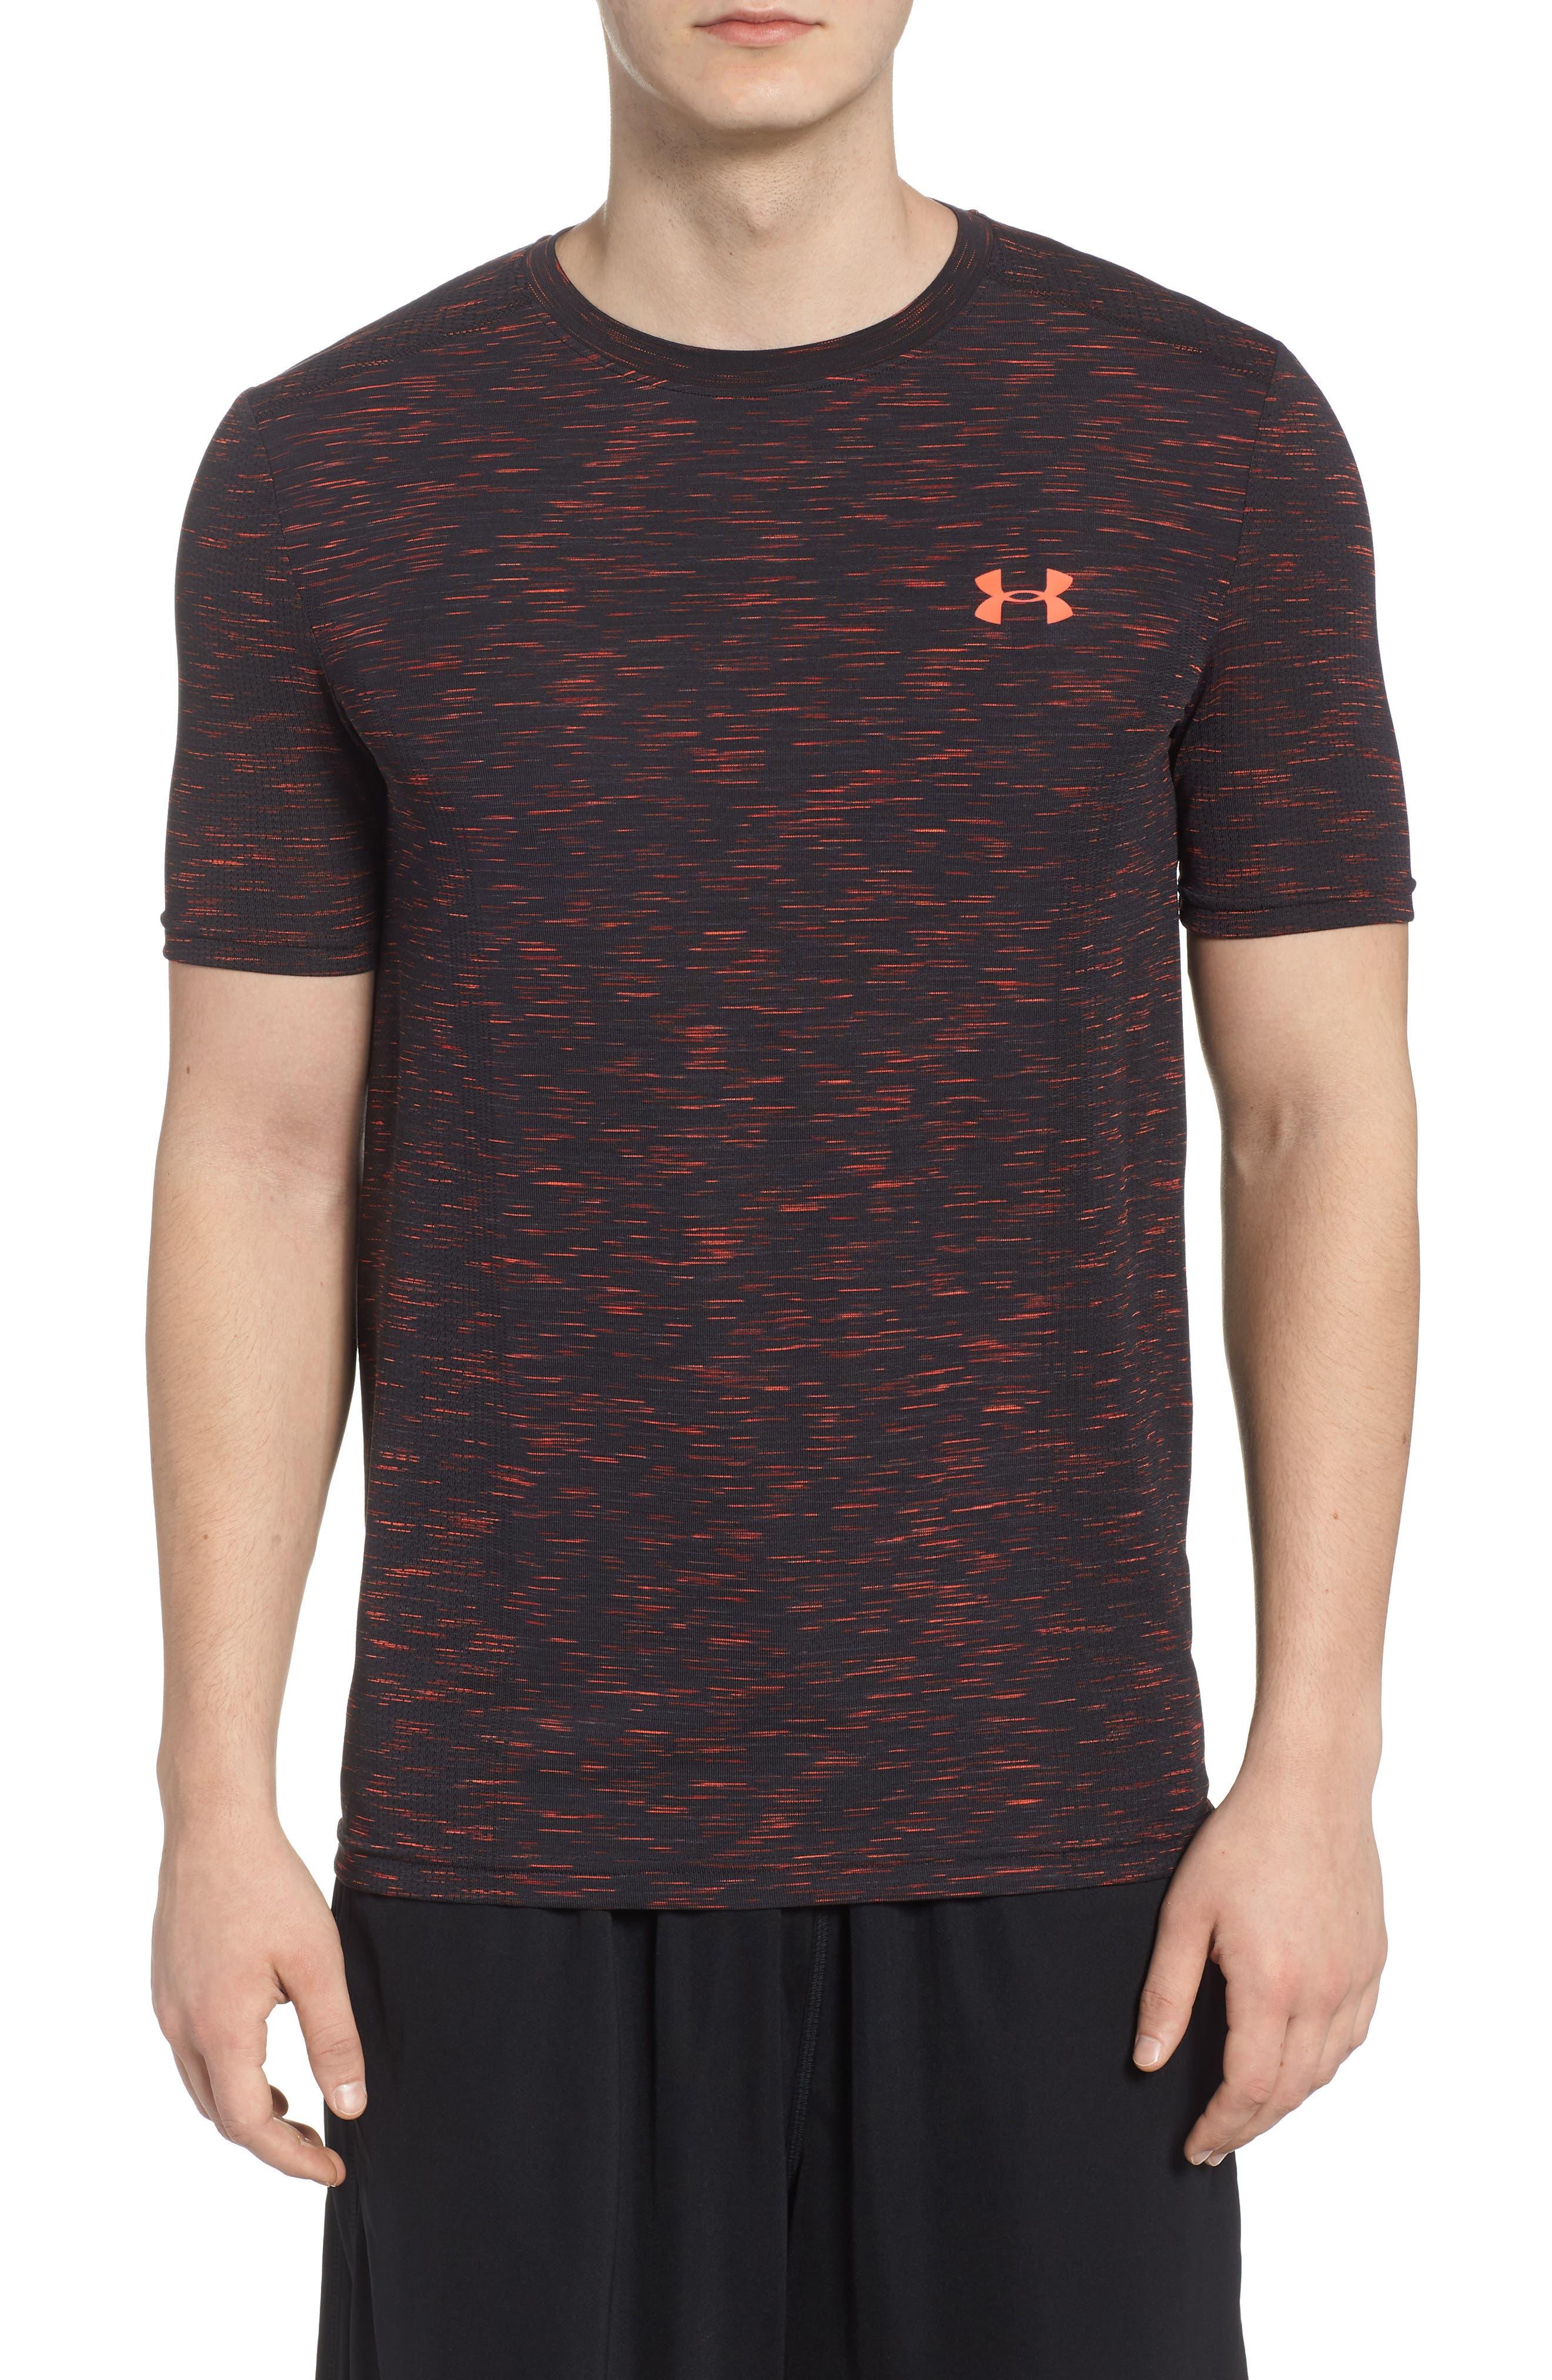 Threadborne Regular Fit T-Shirt,                             Main thumbnail 1, color,                             ANTHRACITE/ NEON CORAL